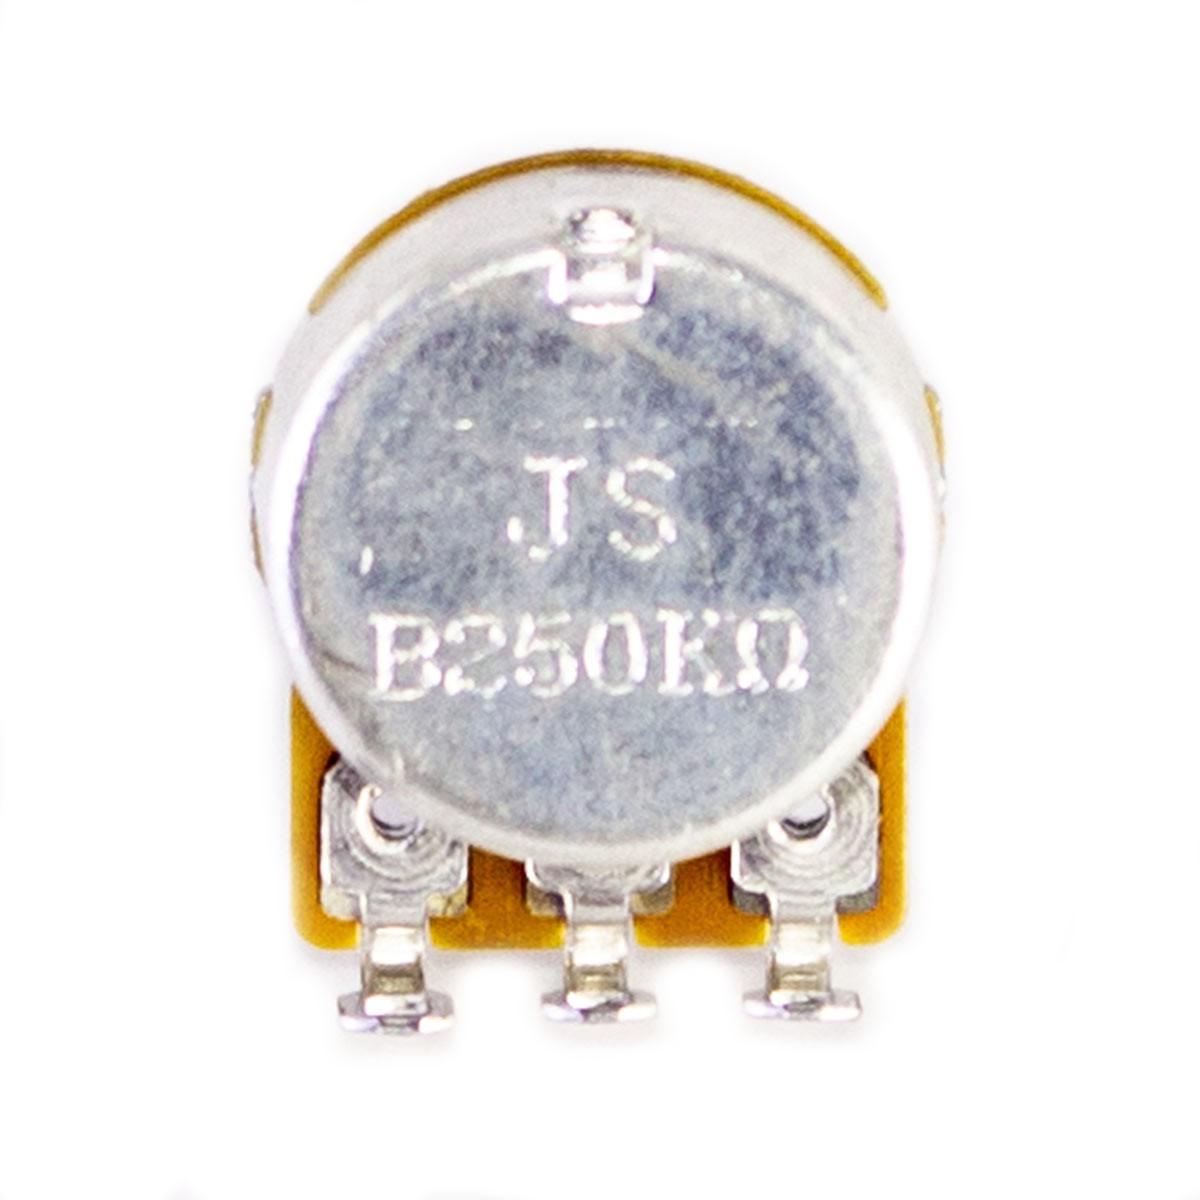 Potenciômetro Spirit B250k Base Pequena Eixo Longo